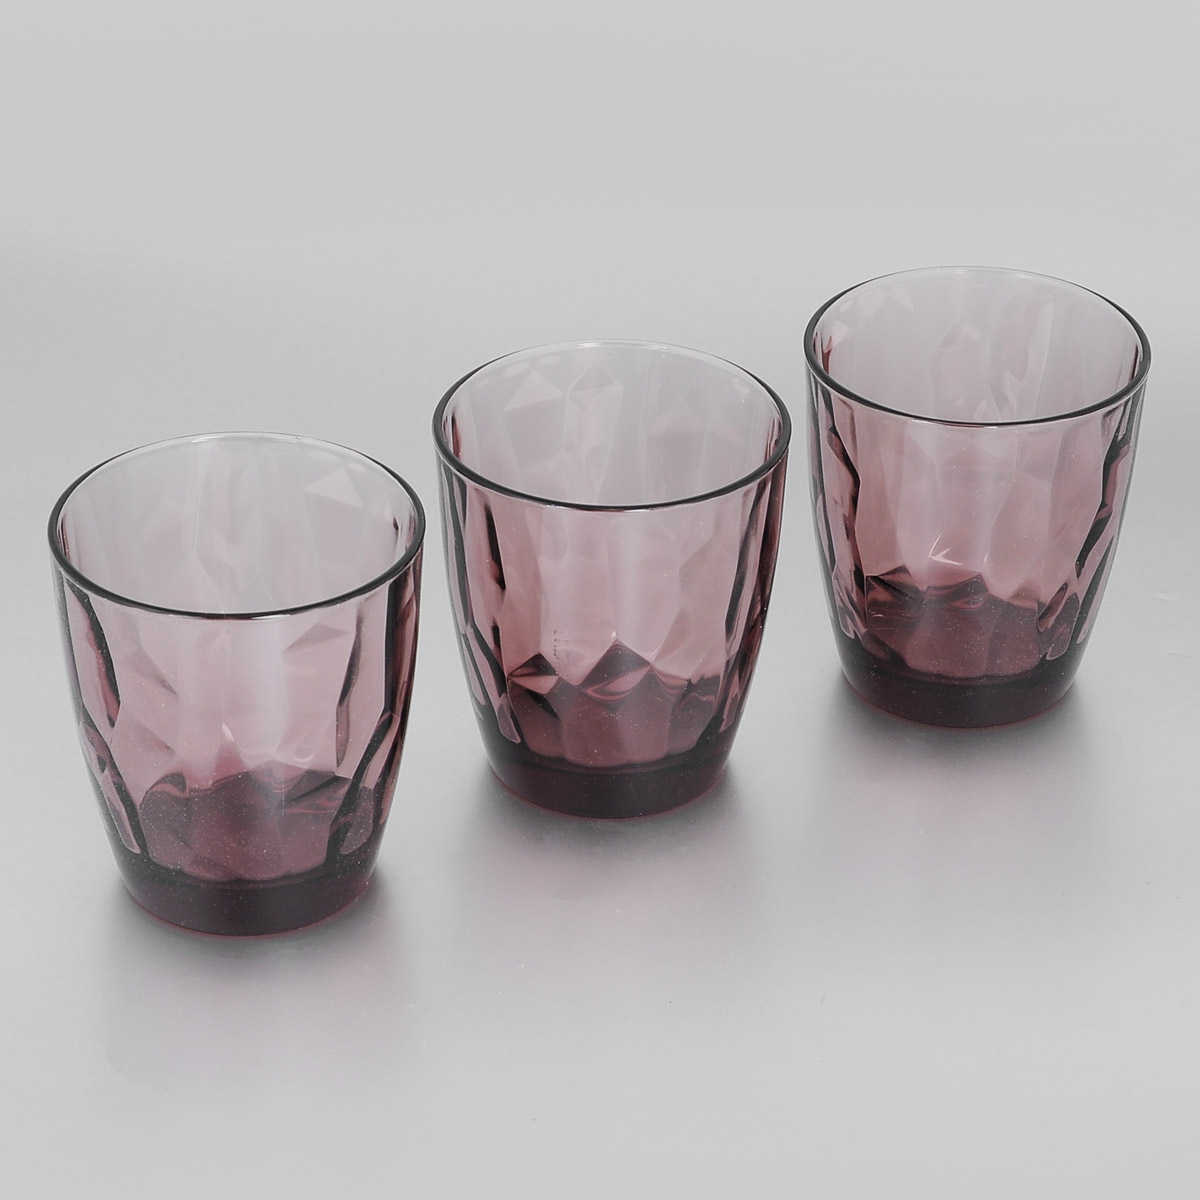 Набор стаканов Bormioli Rocco Diamond Rock Purple, 390 мл, 3 шт набор стаканов bormioli rocco luna 340 мл 3 шт